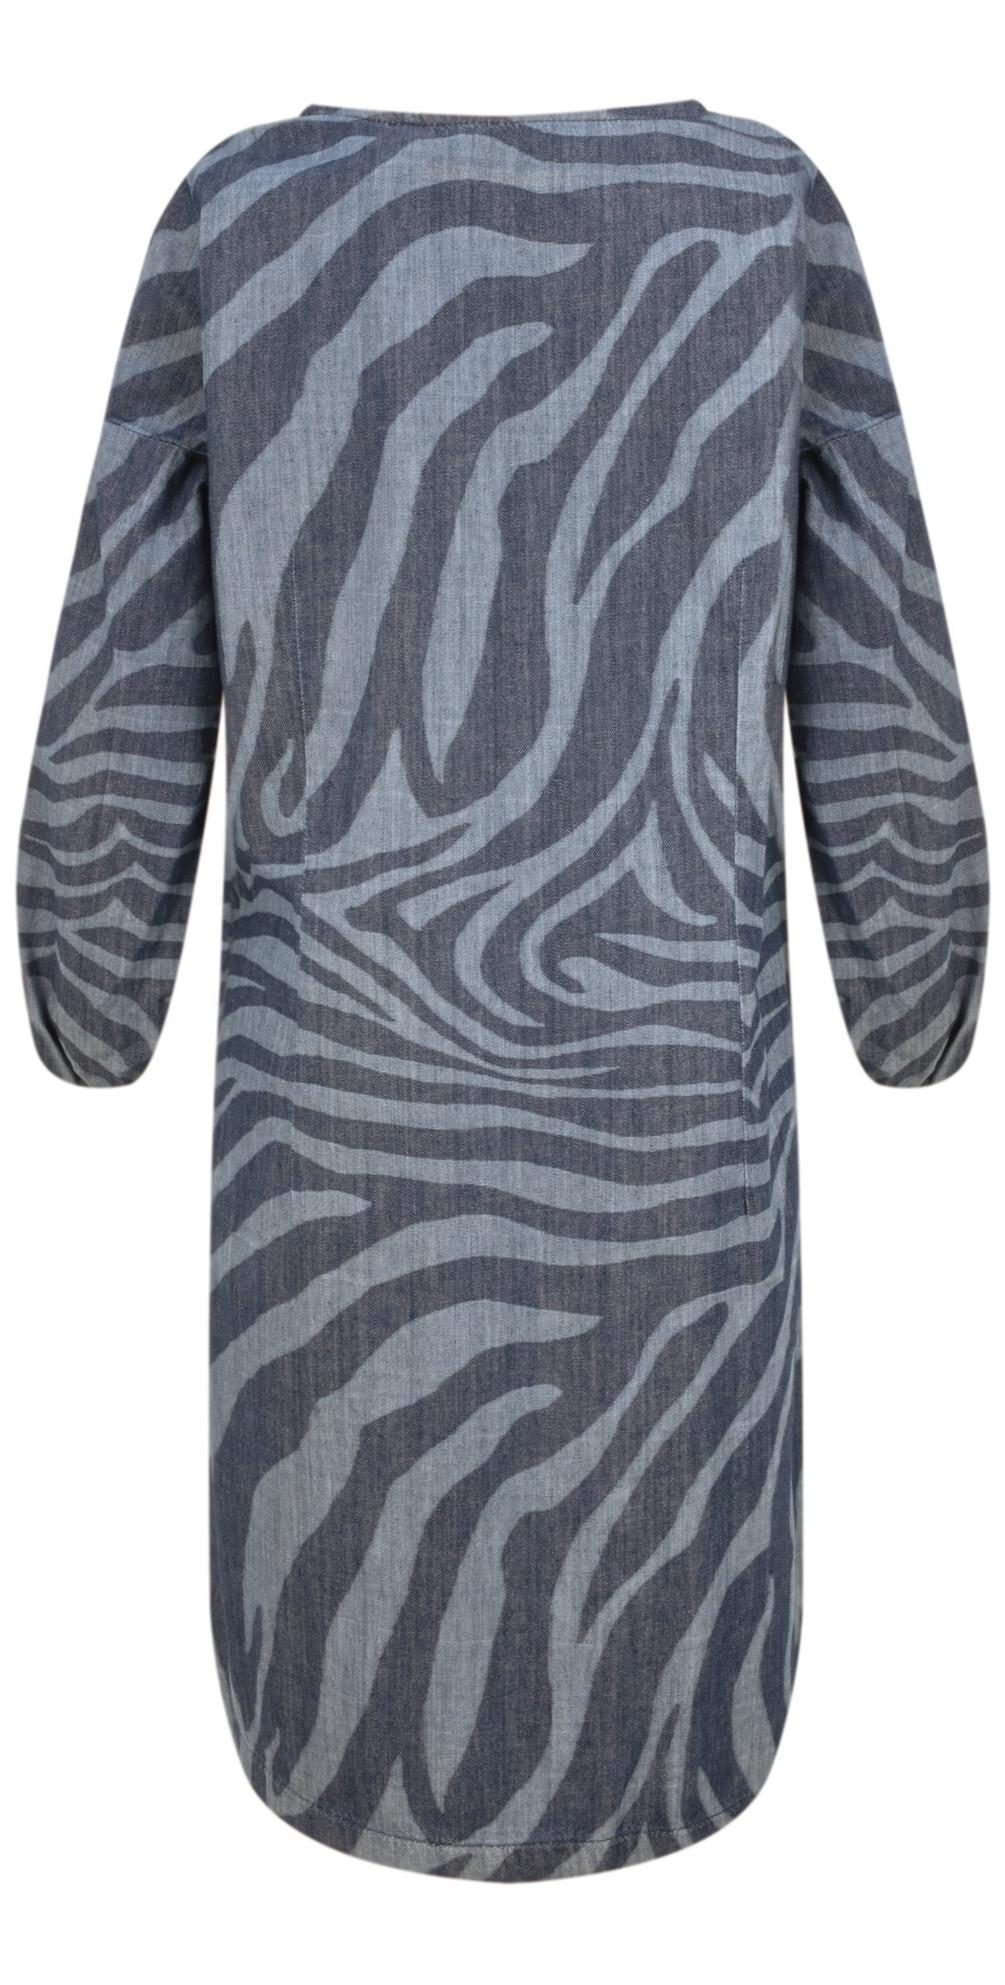 Denim Wash Zebra Dress main image